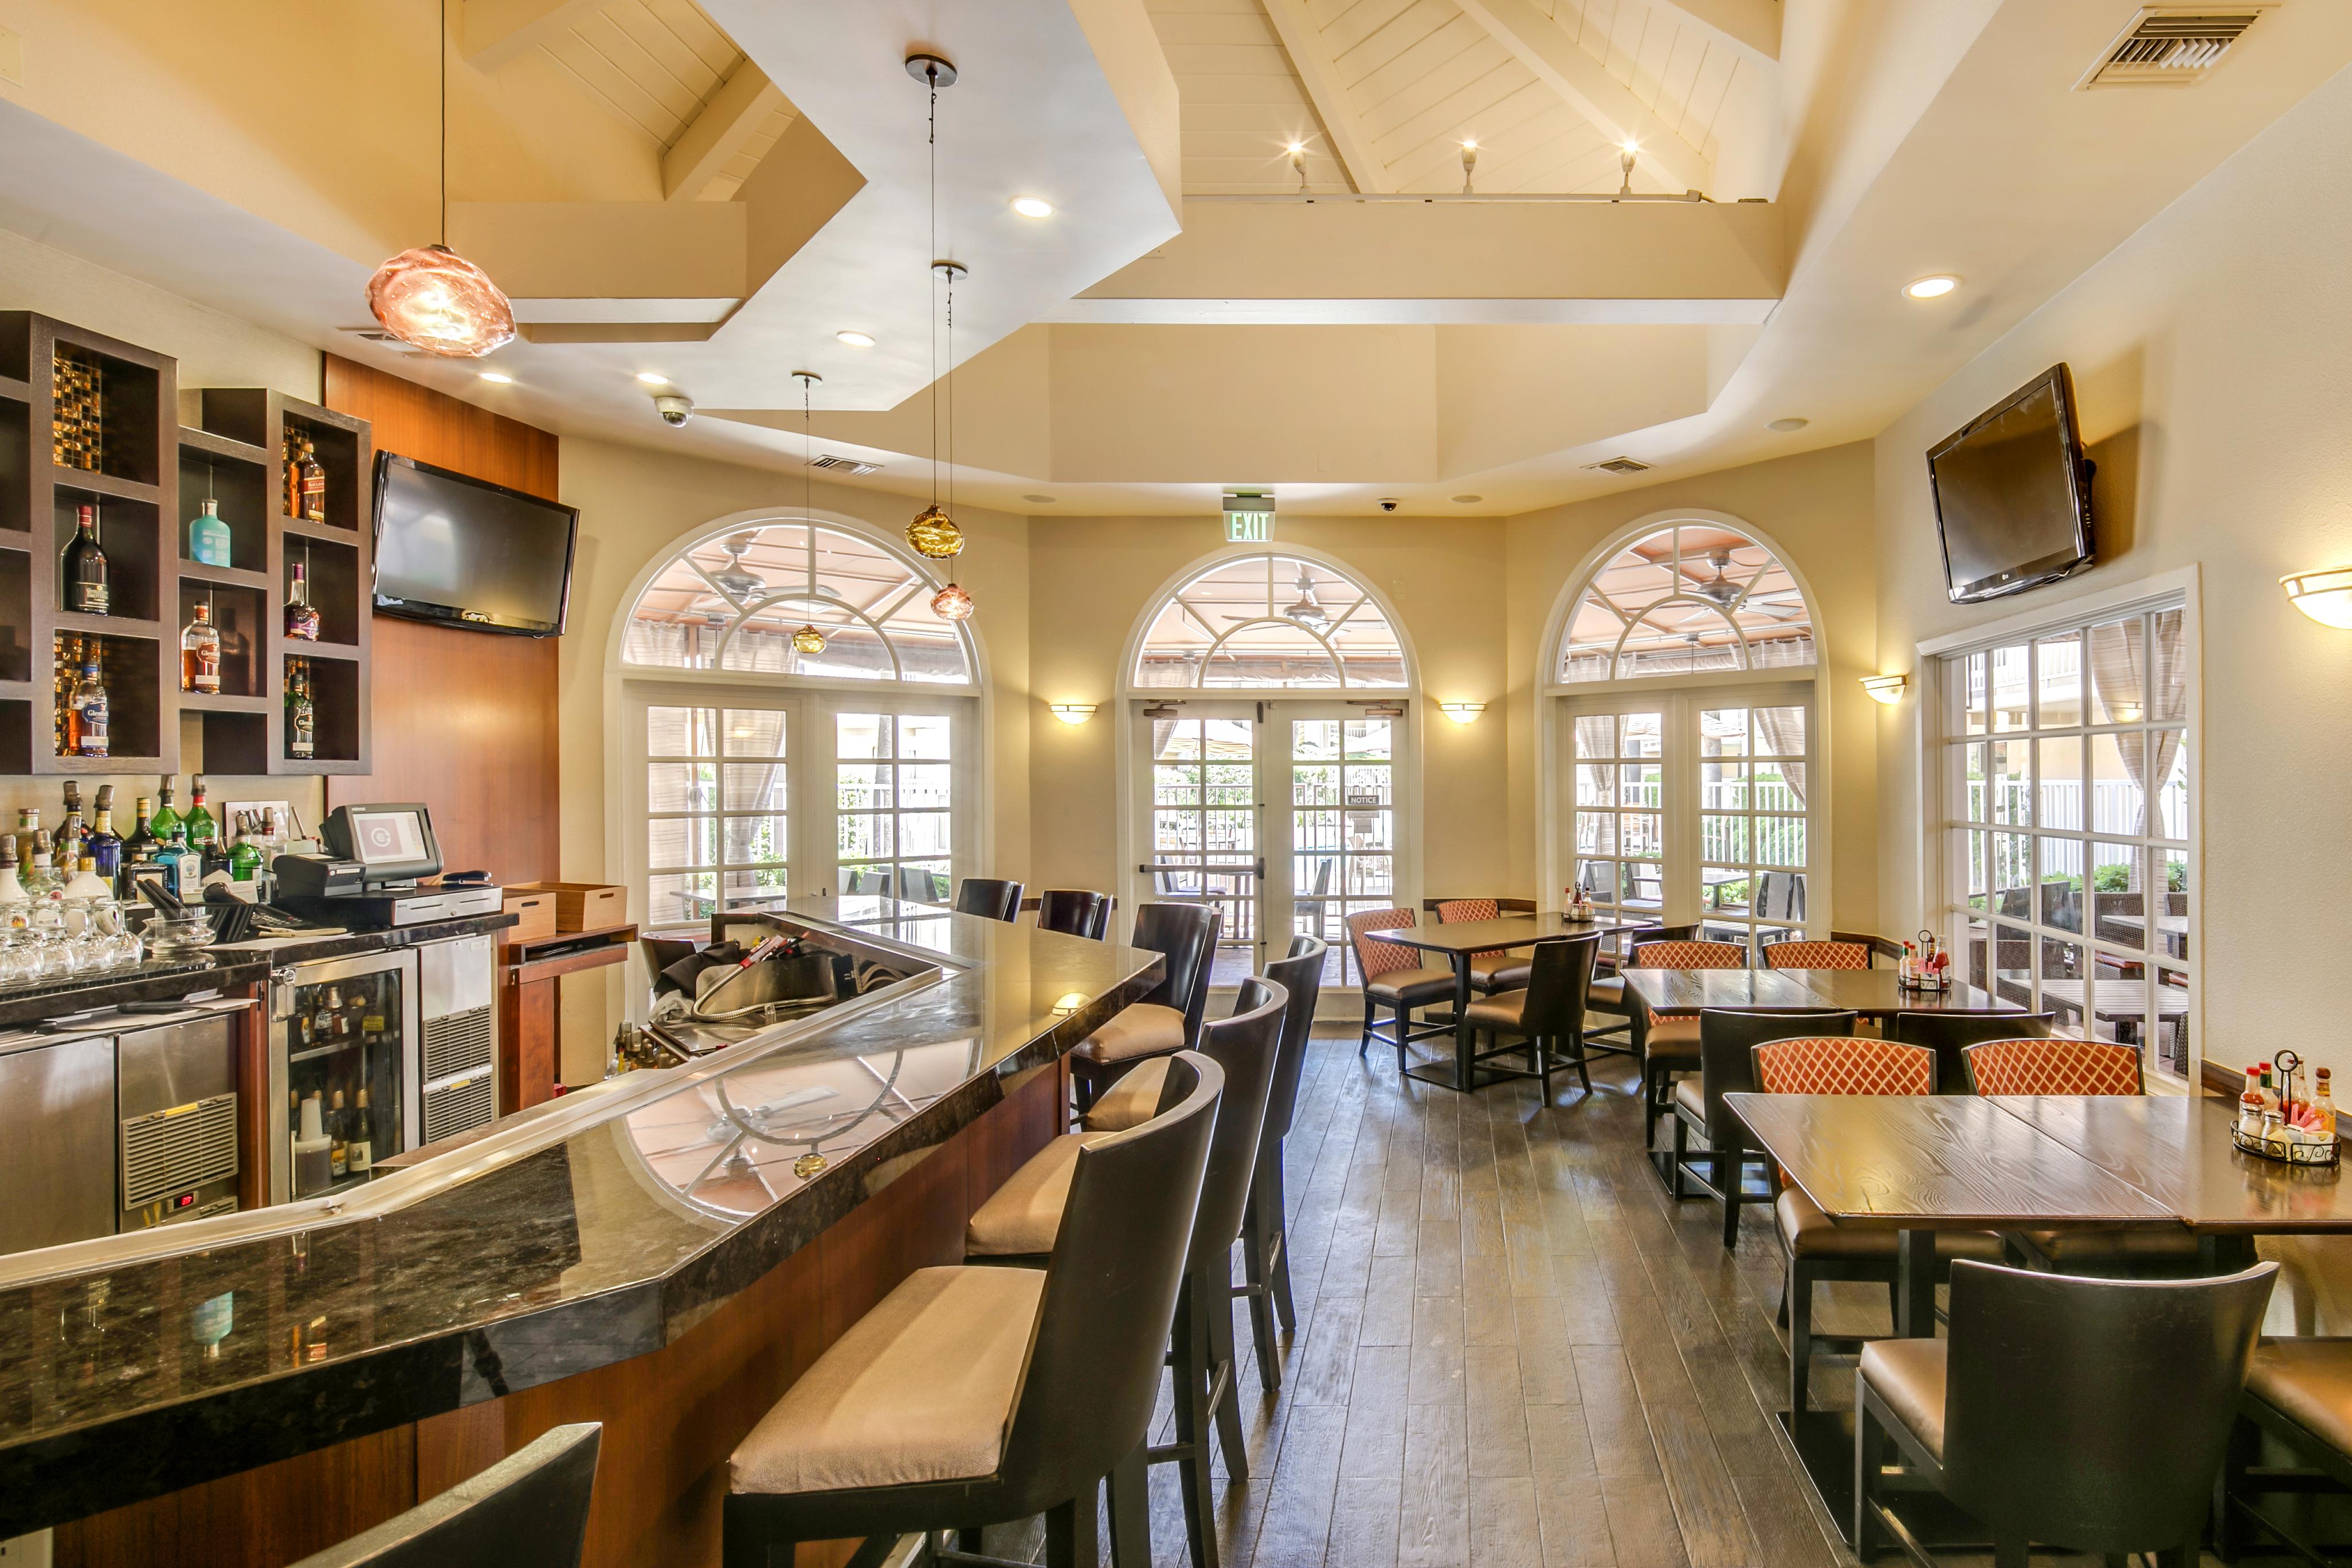 Rar Hospitality Assumes Management Of Radisson Rancho Bernardo